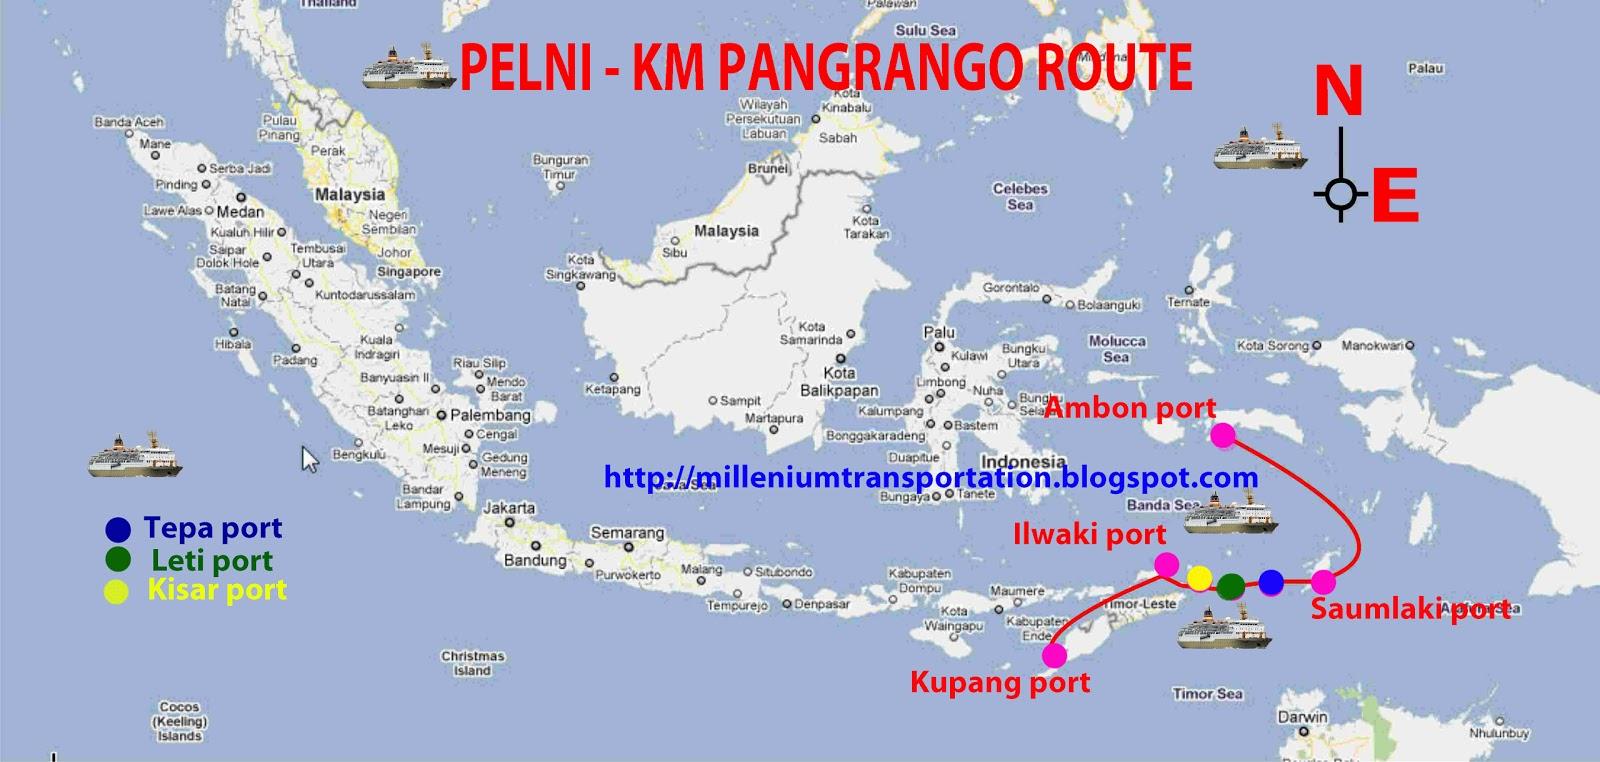 transportspot pelni routes map pangrango ship. Black Bedroom Furniture Sets. Home Design Ideas